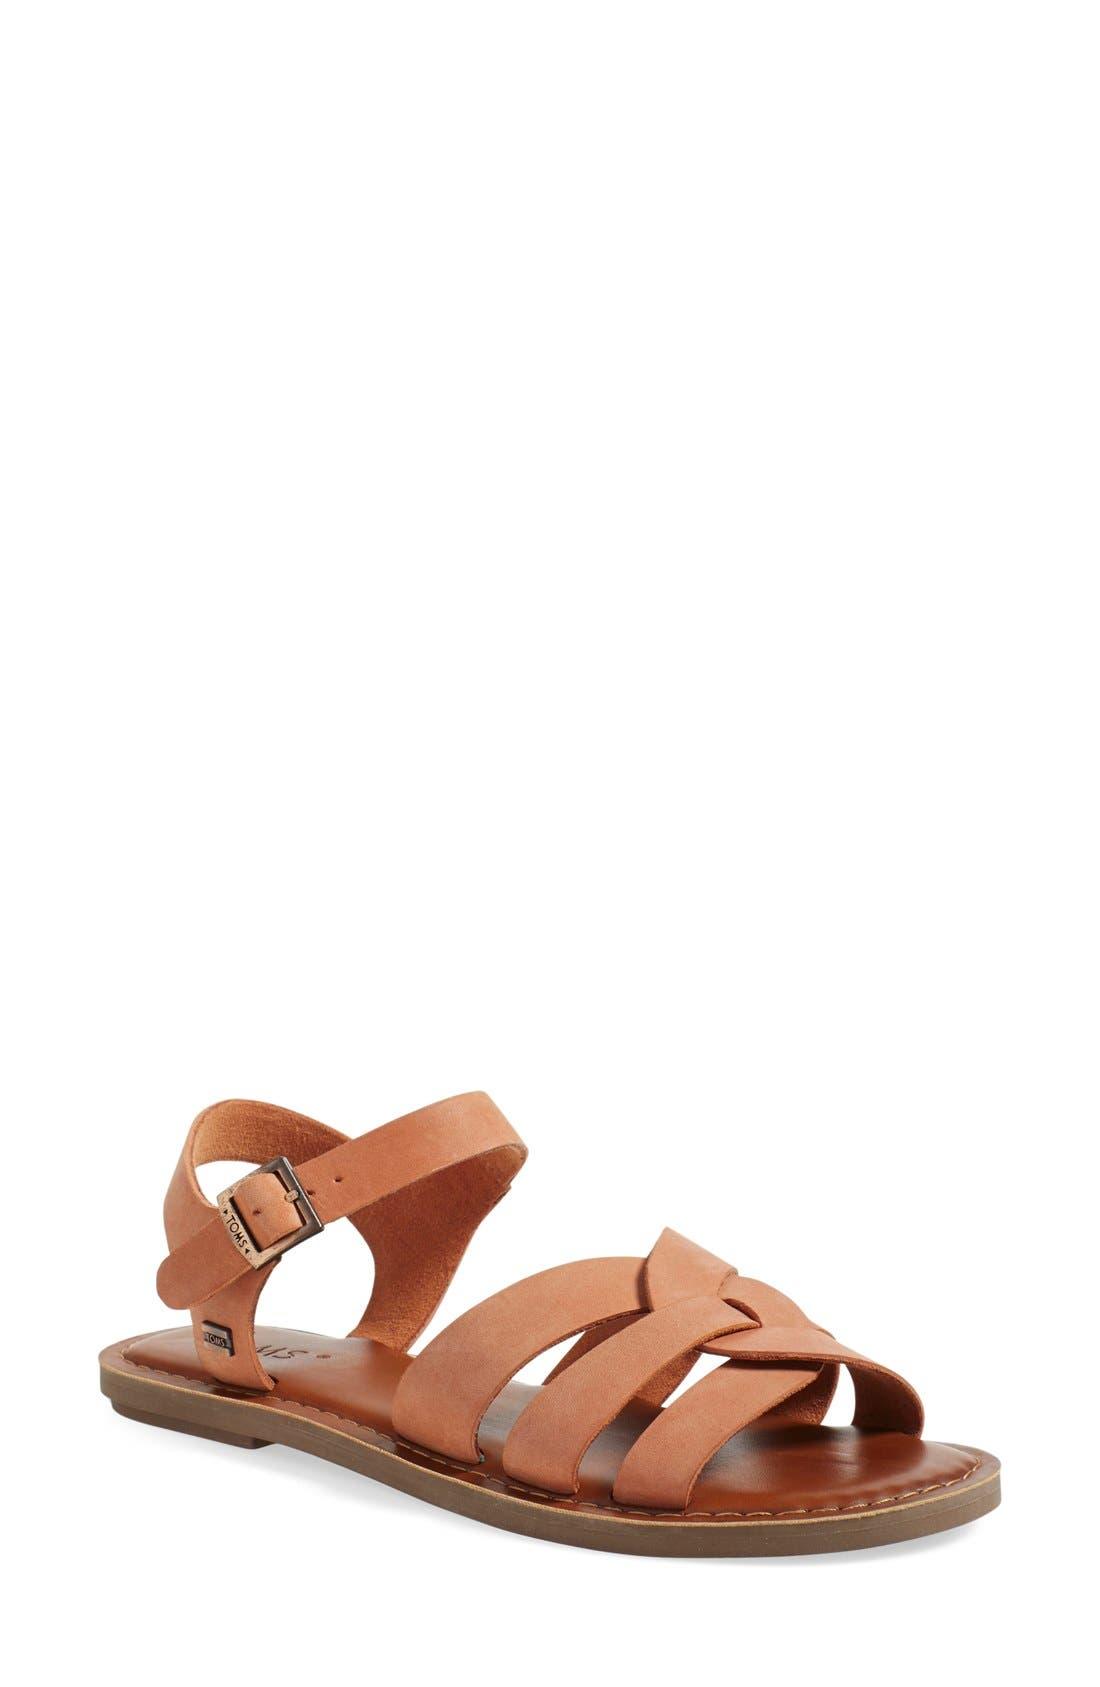 Main Image - TOMS 'Zoe' Flat Quarter Strap Sandal (Women)